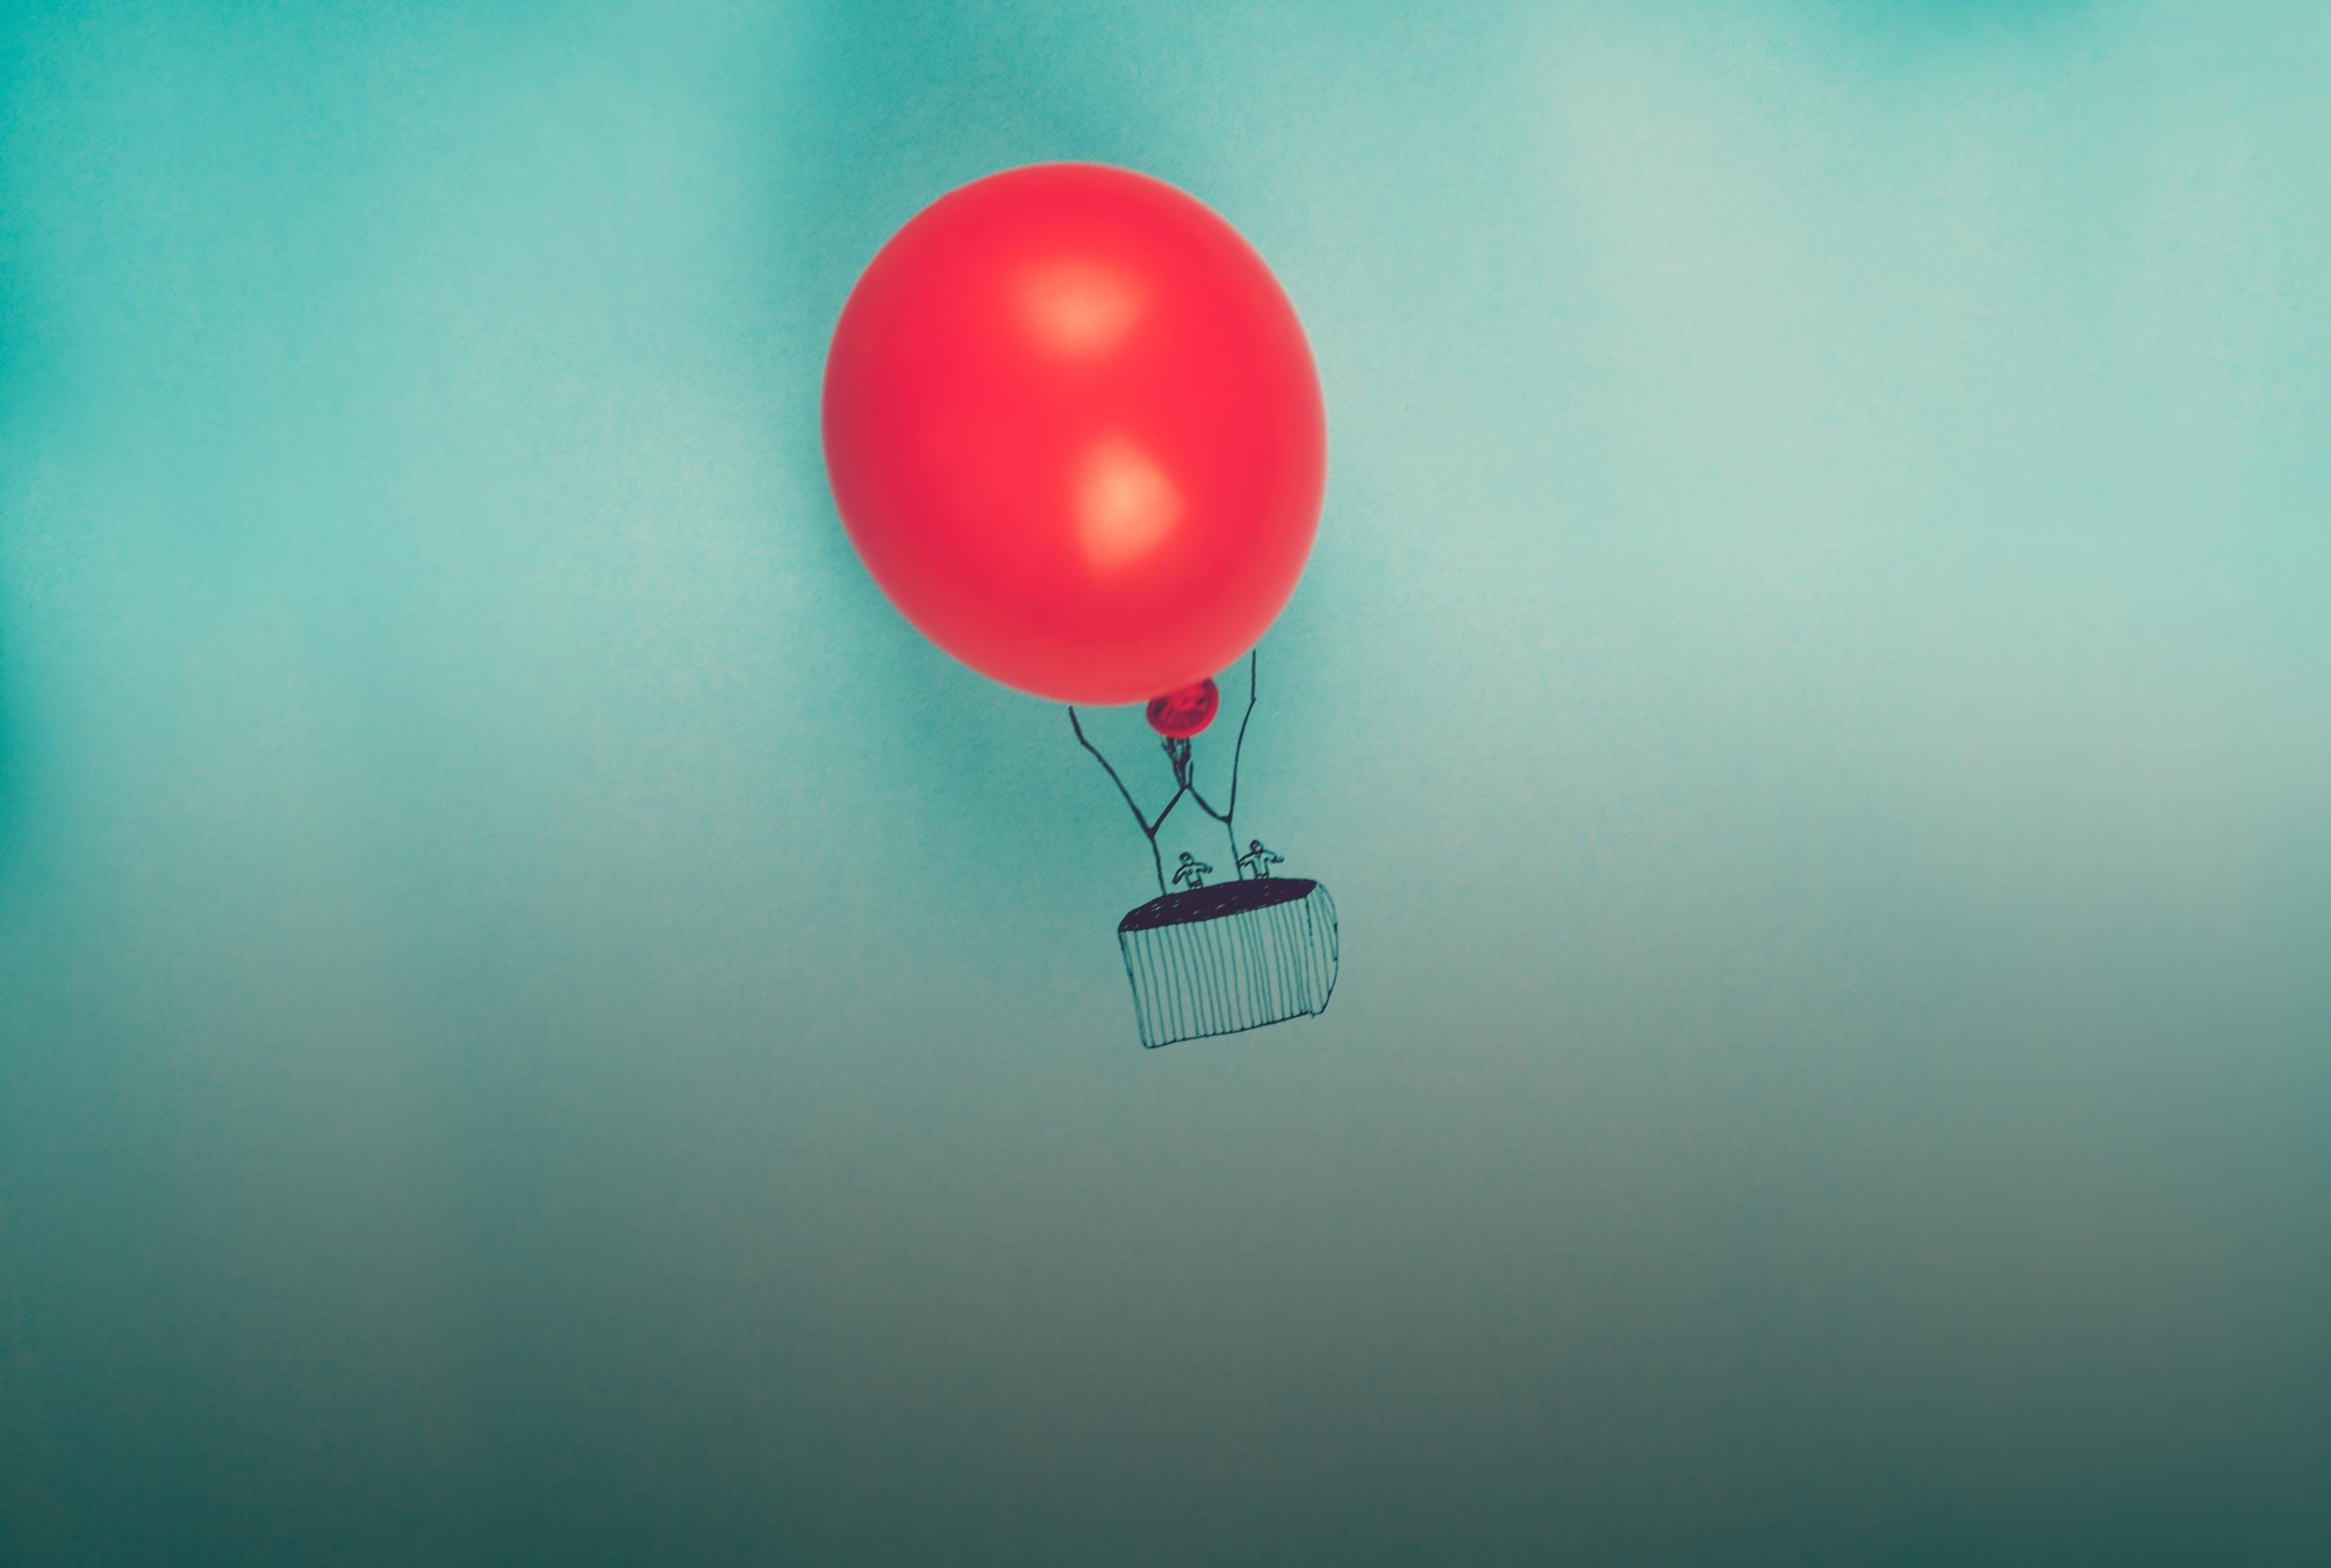 Postdoc ballon.95a461a1d41eab0a6102853abfb5b69f7